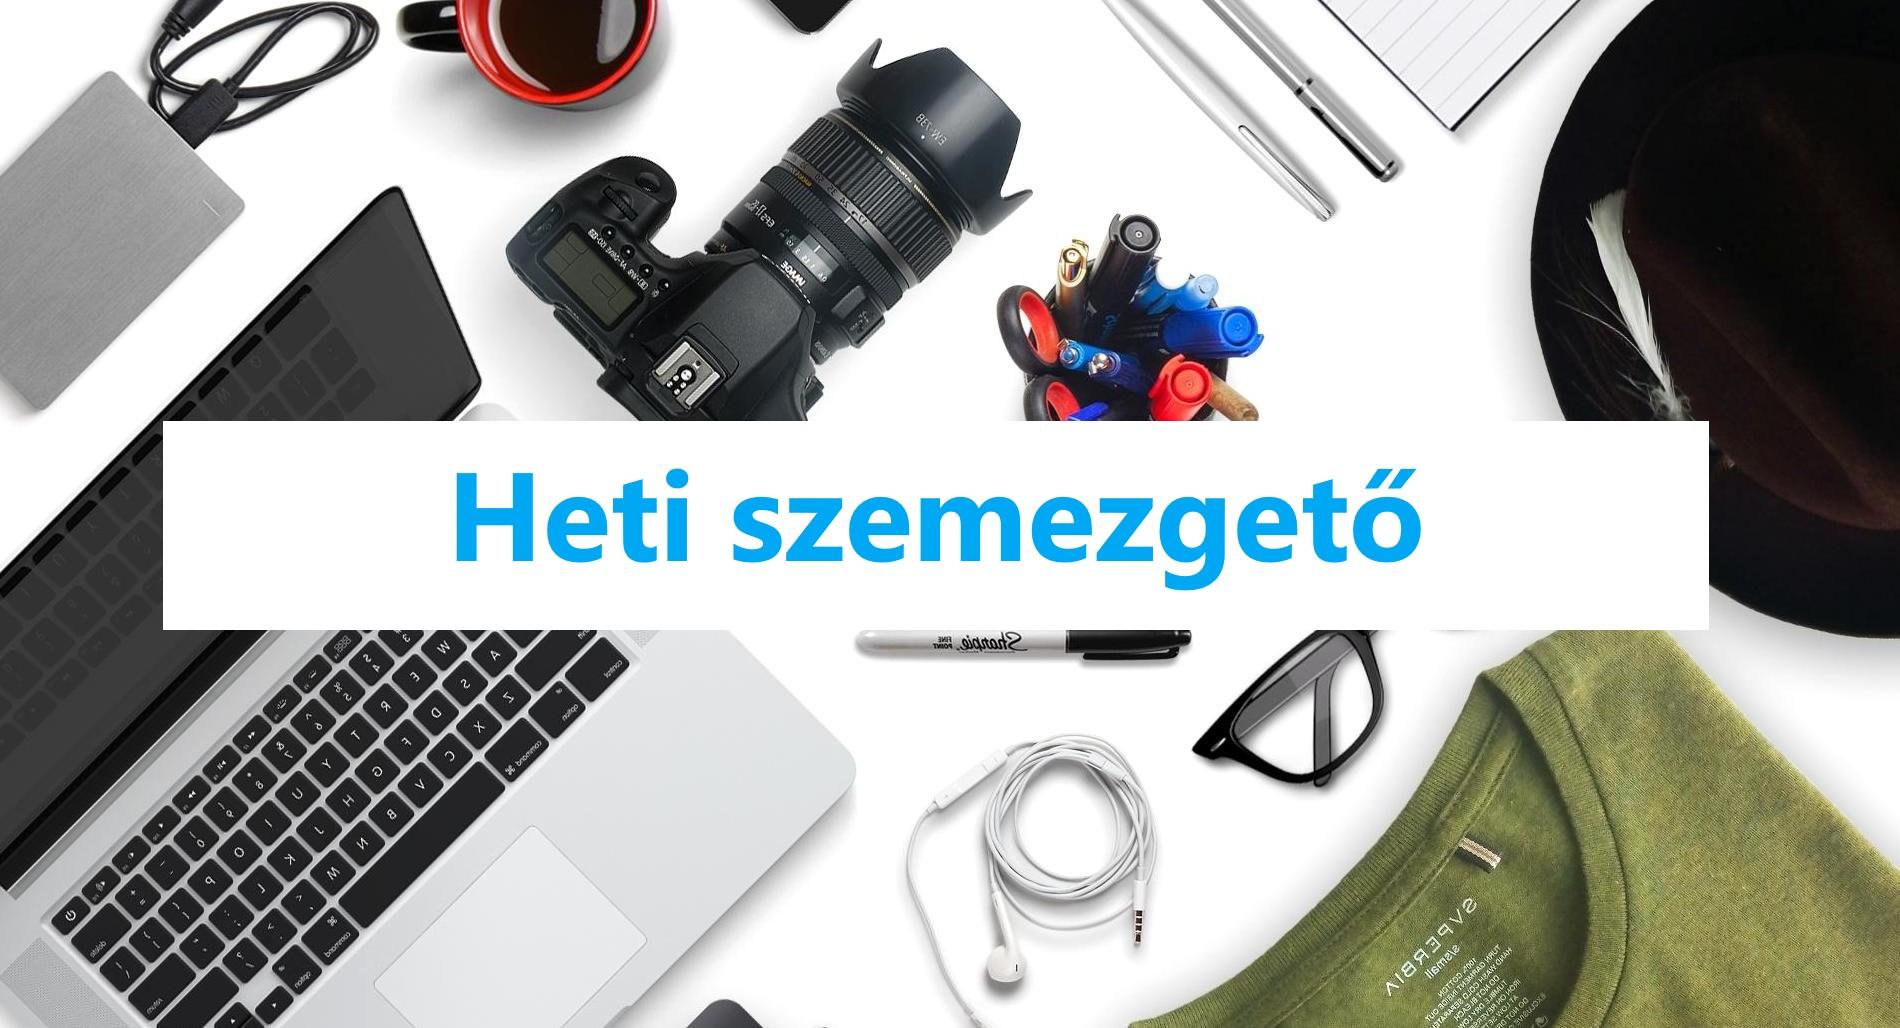 heti_szemezgeto_uj_66.jpg